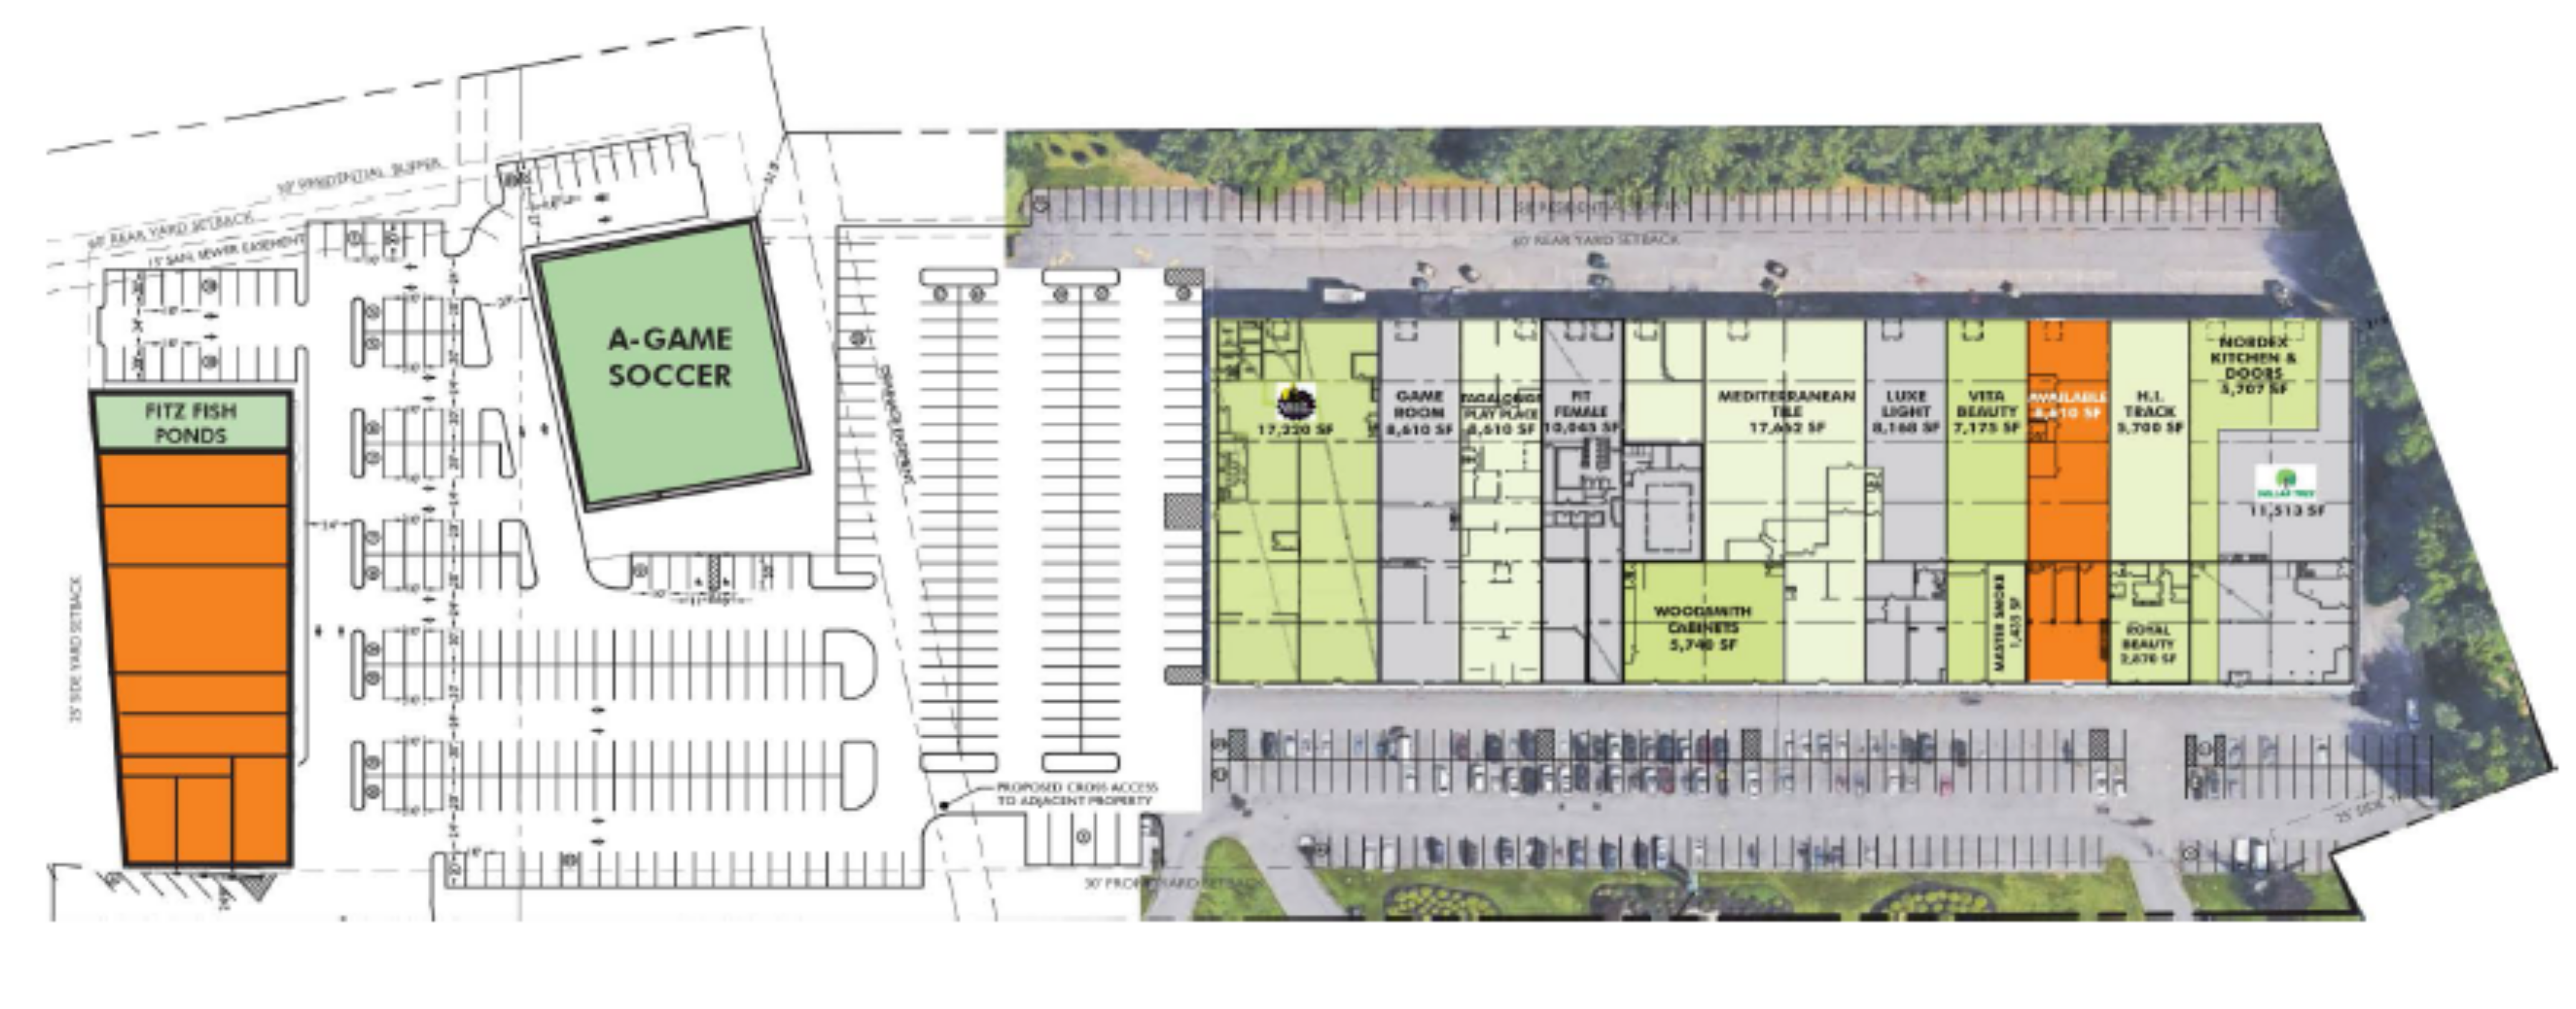 Crown Plaza Expansion: site plan